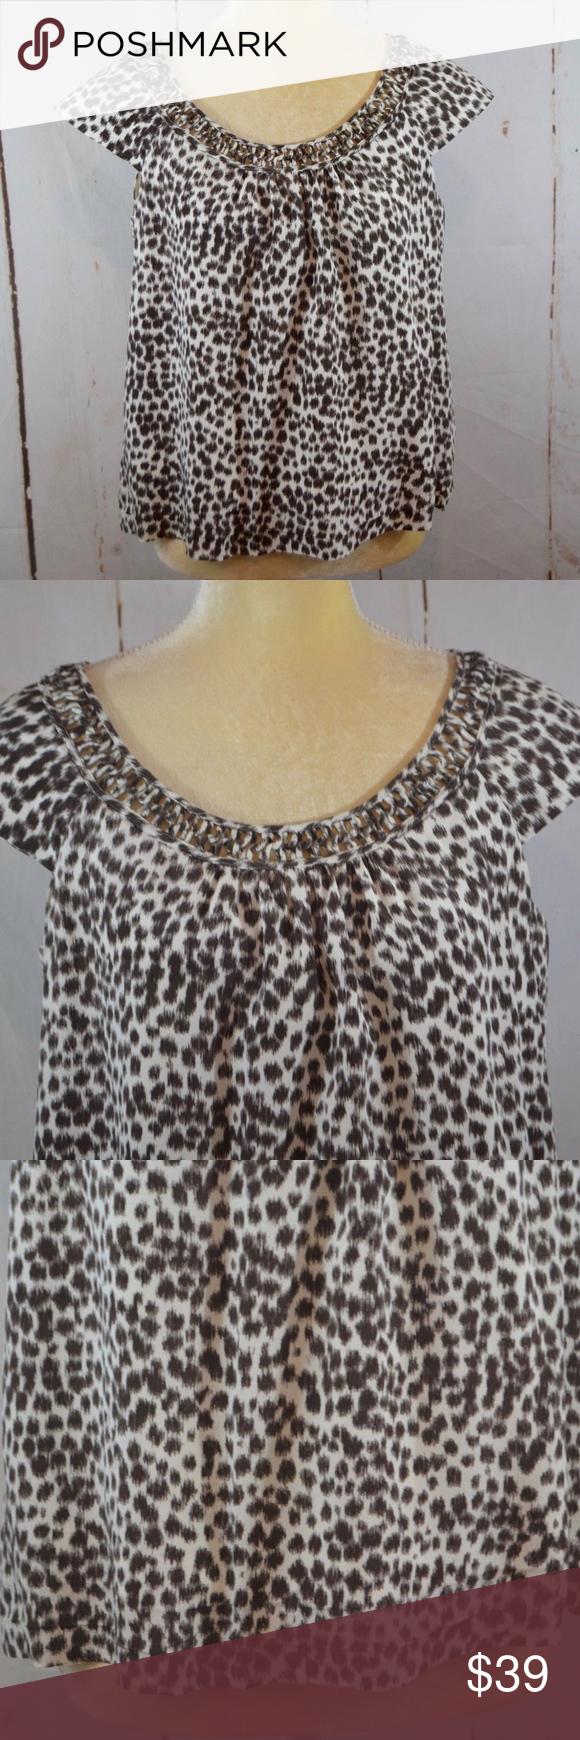 16129bc27c698 Kate Spade Whitney Cream Safari Animal Print Top Women s blouse from Kate  Spade New York